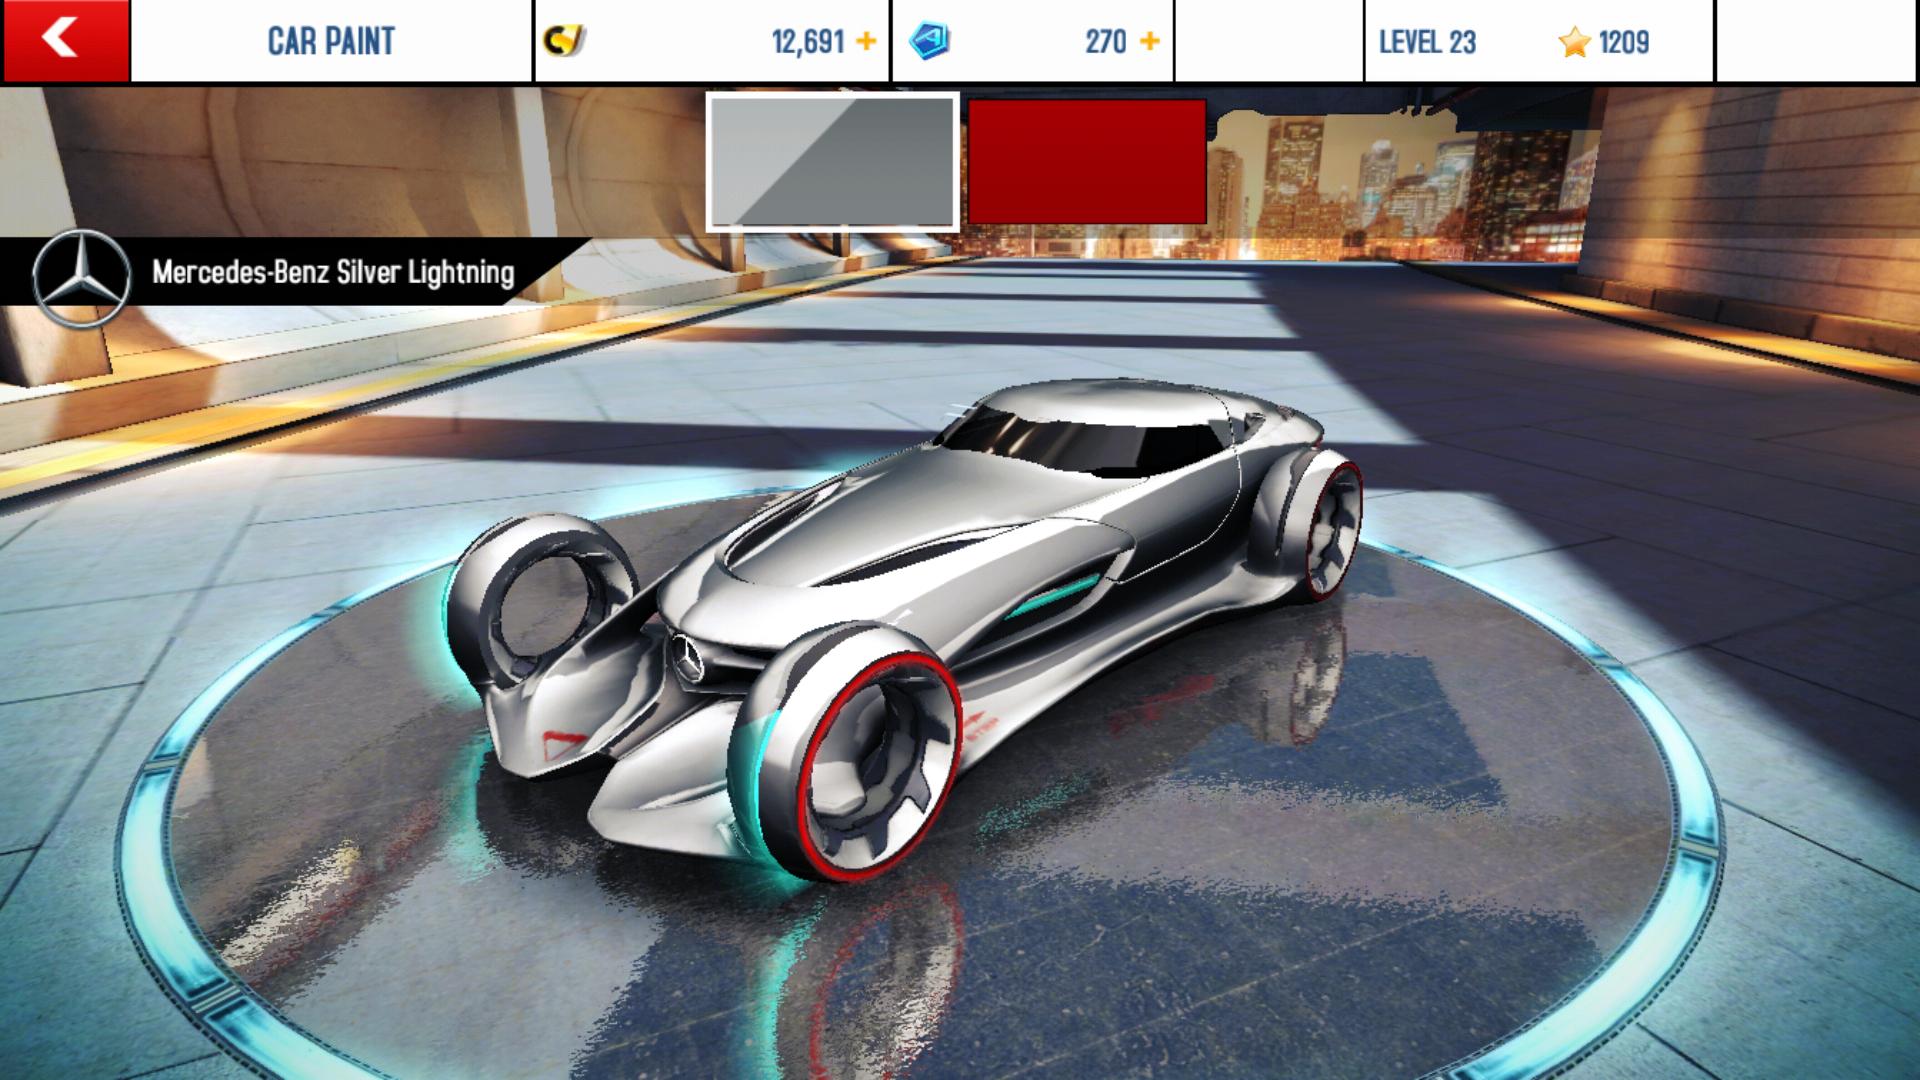 mercedes lightning gallery - Mercedes Benz Silver Lightning Real